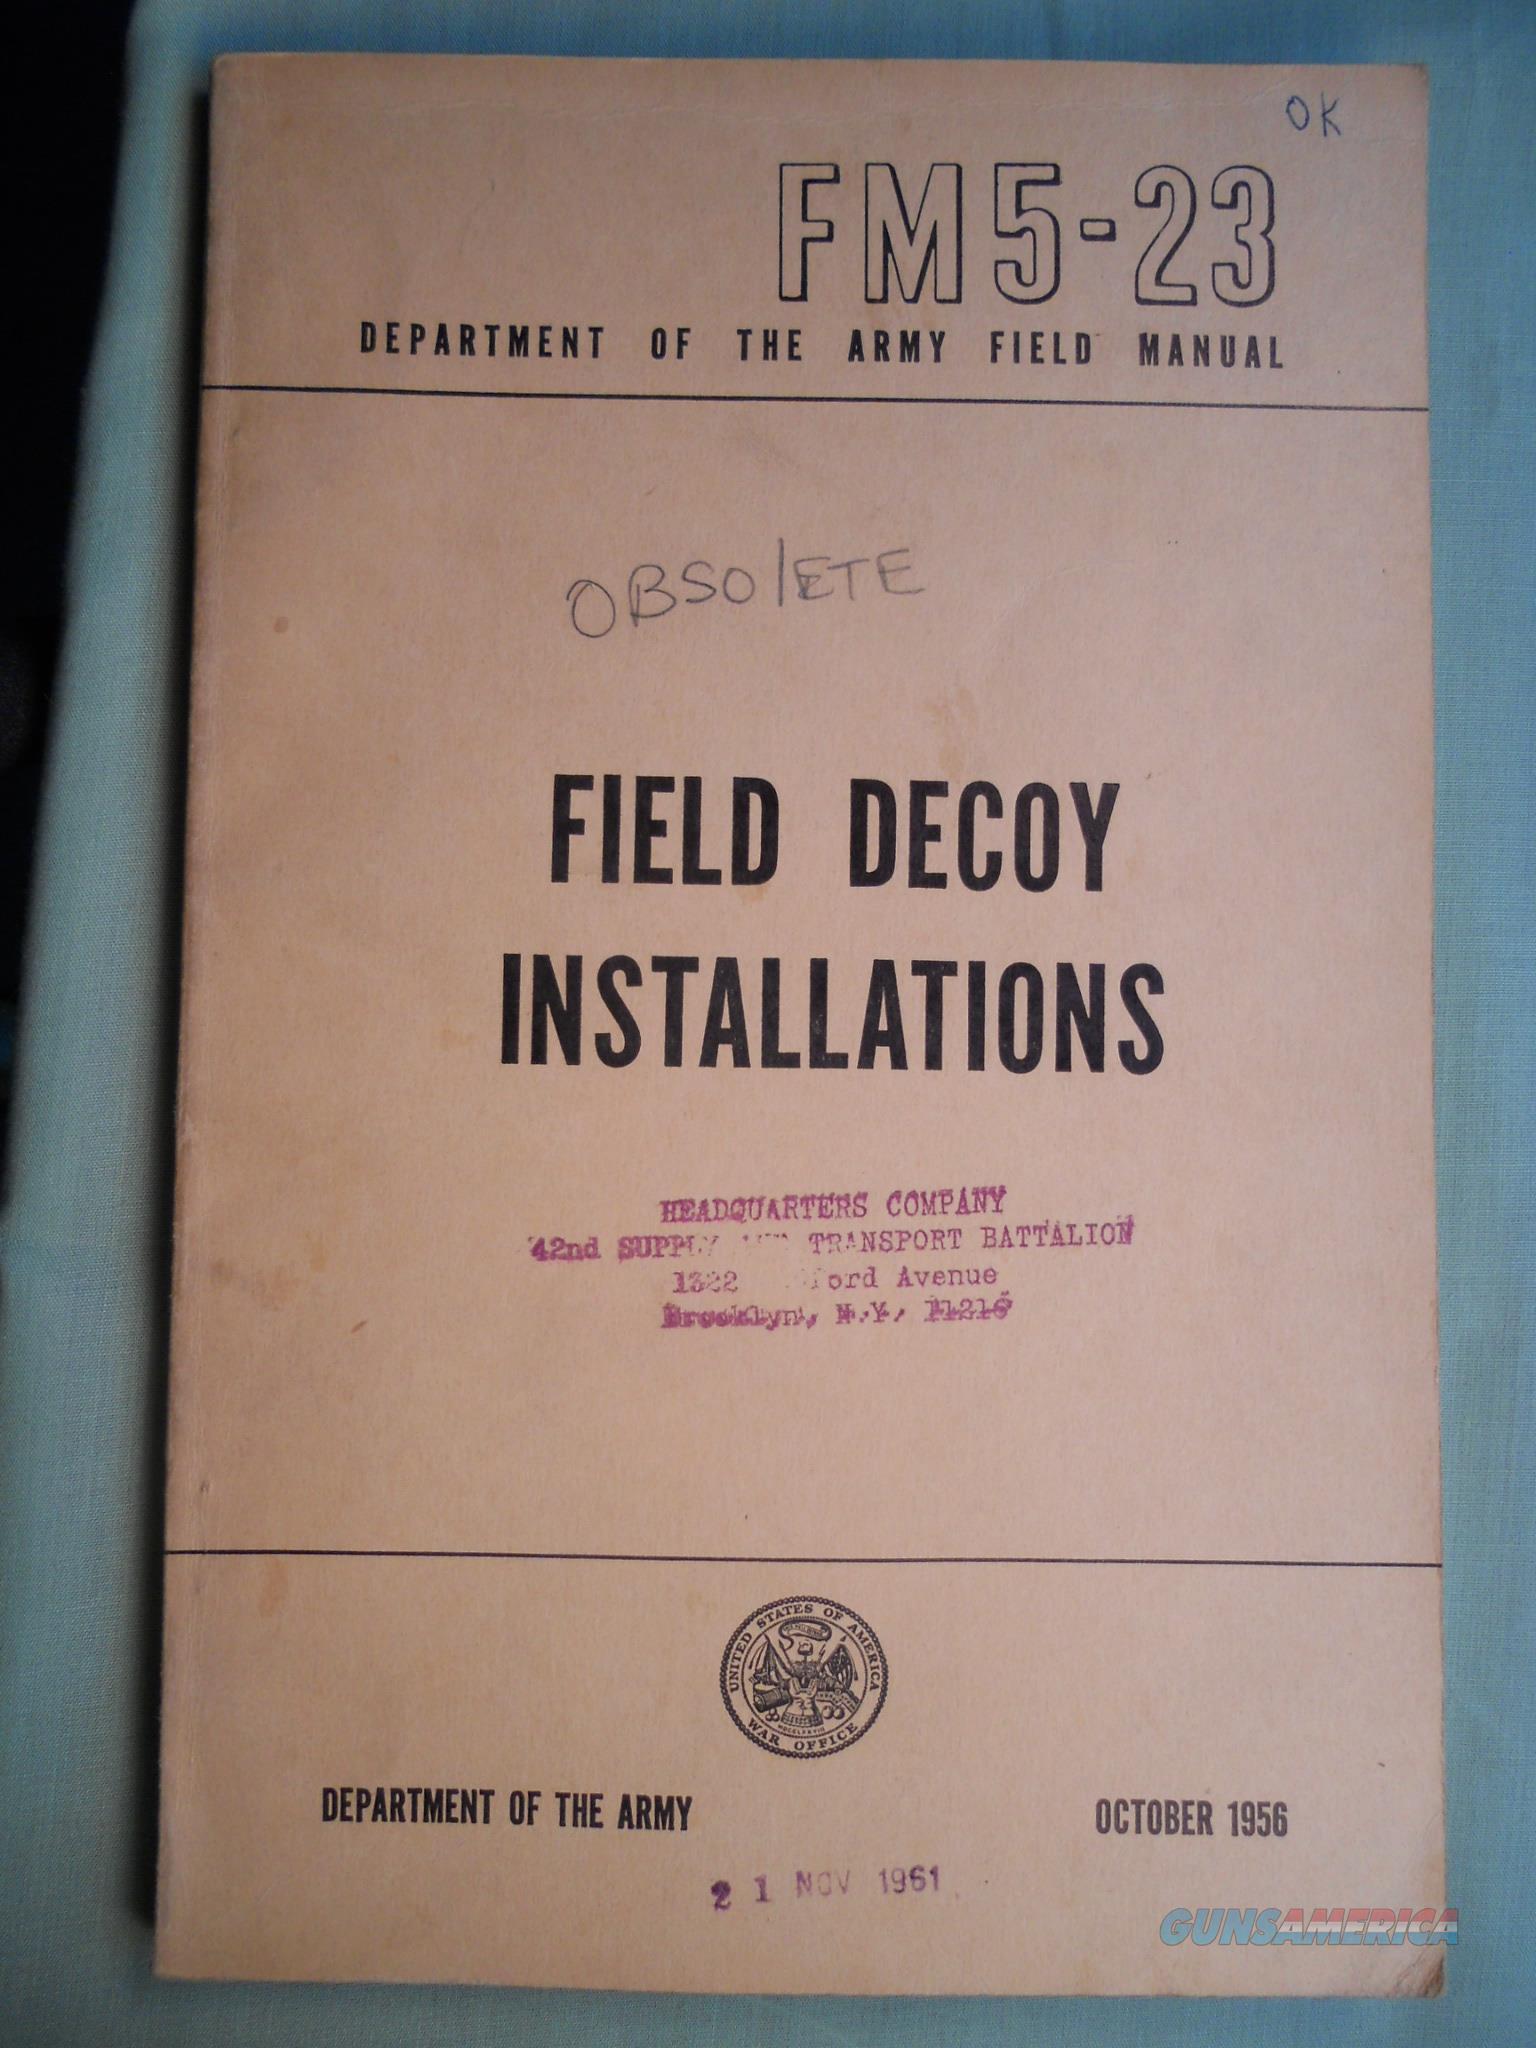 FM 5-23 FIELD DECOY INSTALLATIONS OCT 1956  Non-Guns > Military > Books